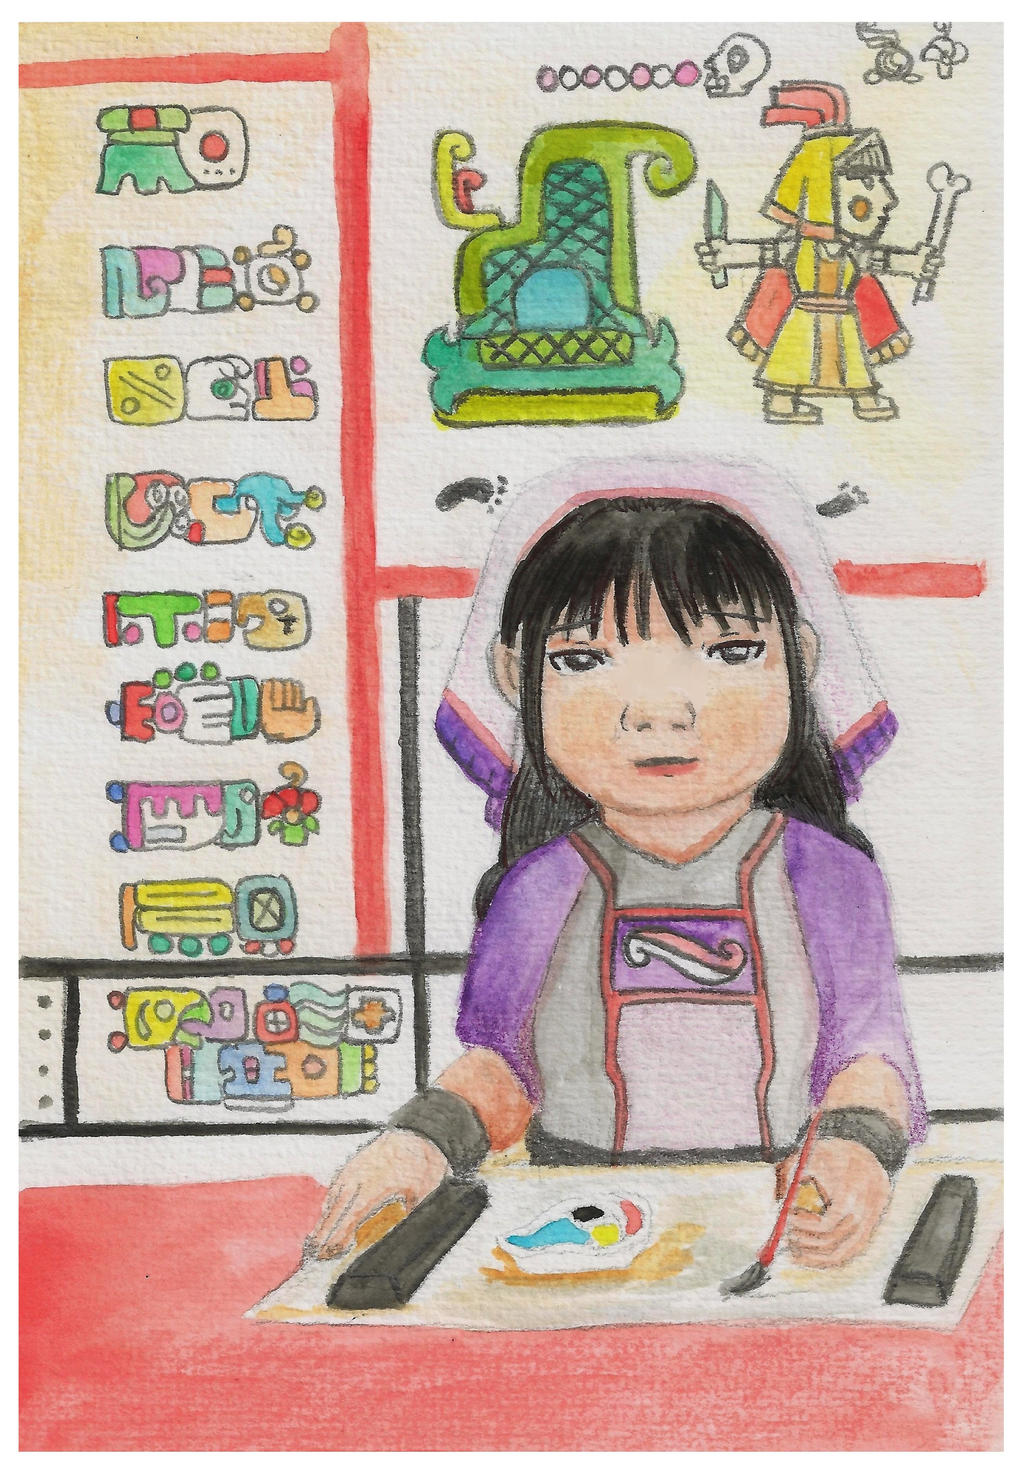 The treasure of wisdom by Rufina-Tomoyo